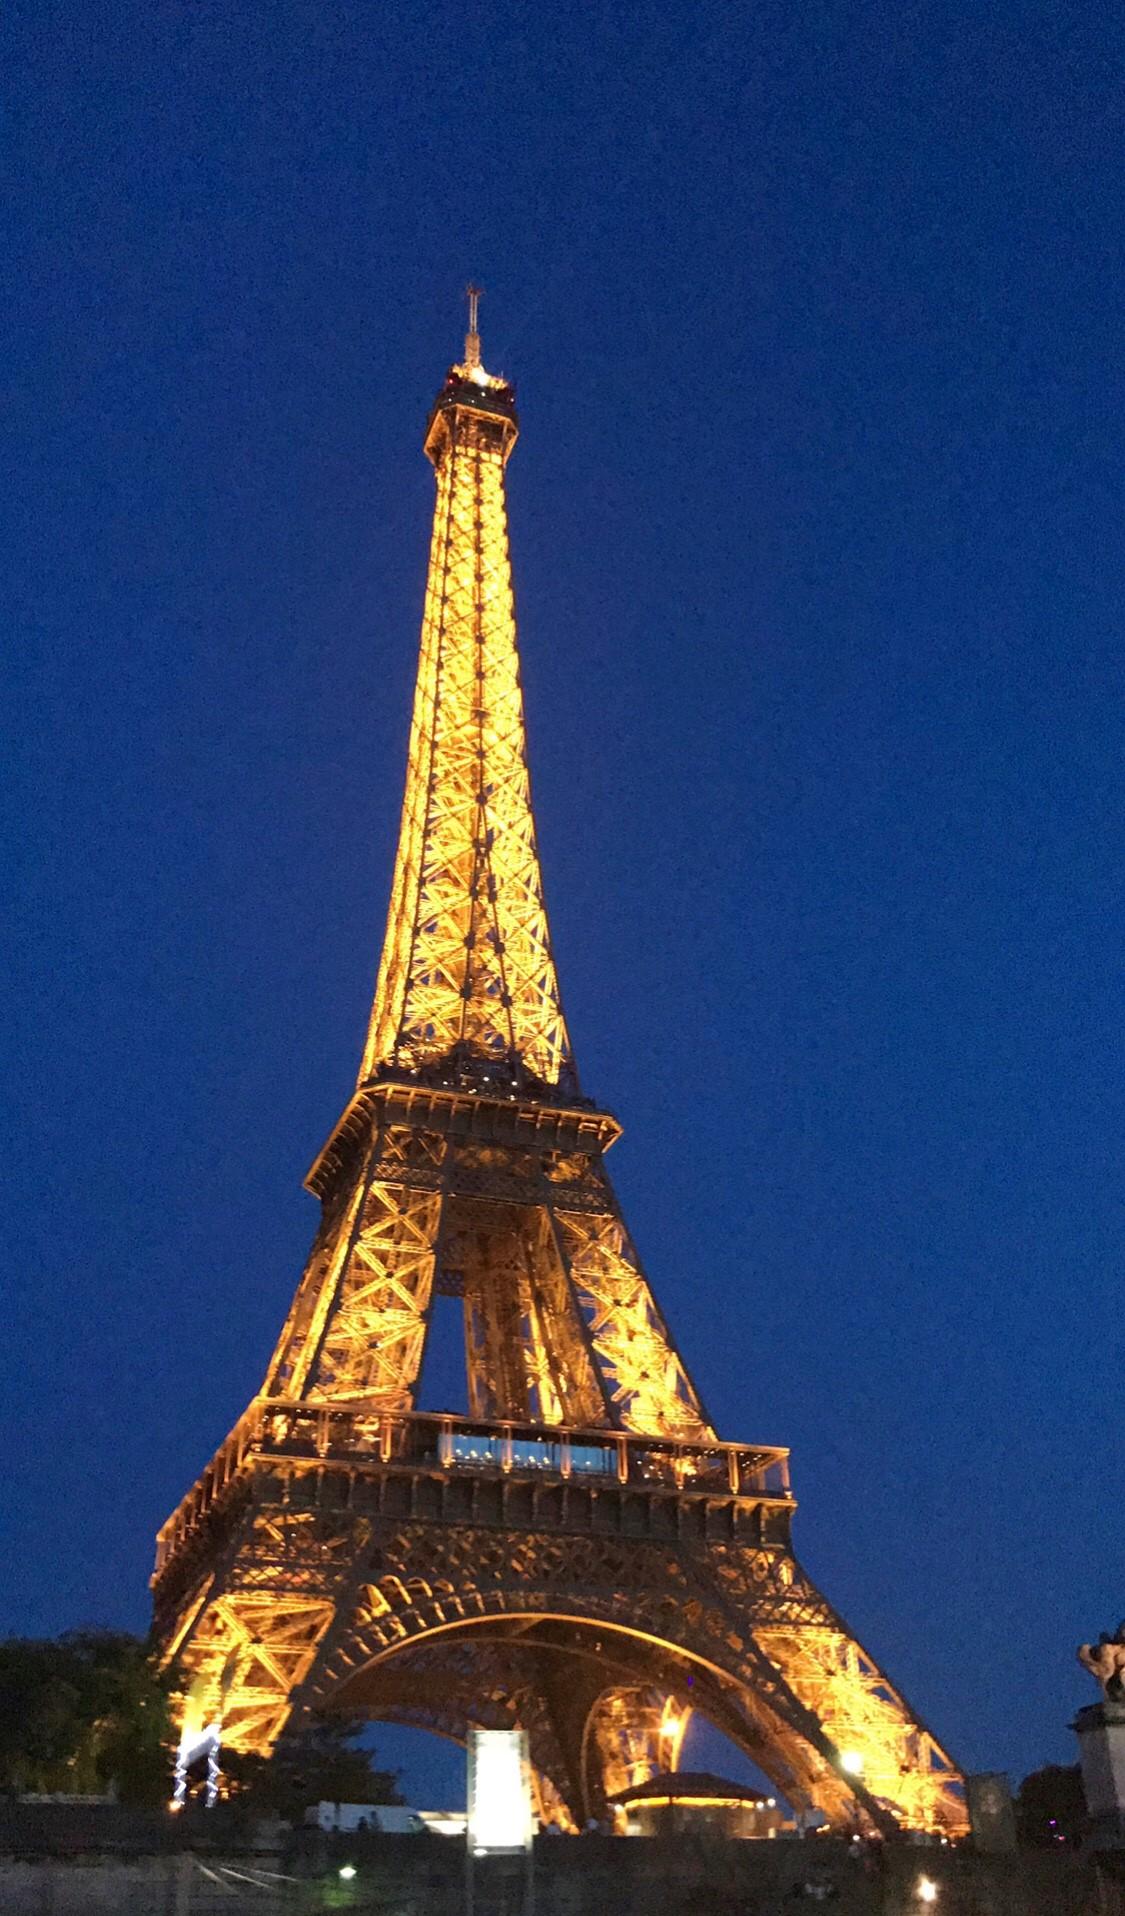 Kuna Eiffel Towers Secret Room Mystery Known By Few Tourism